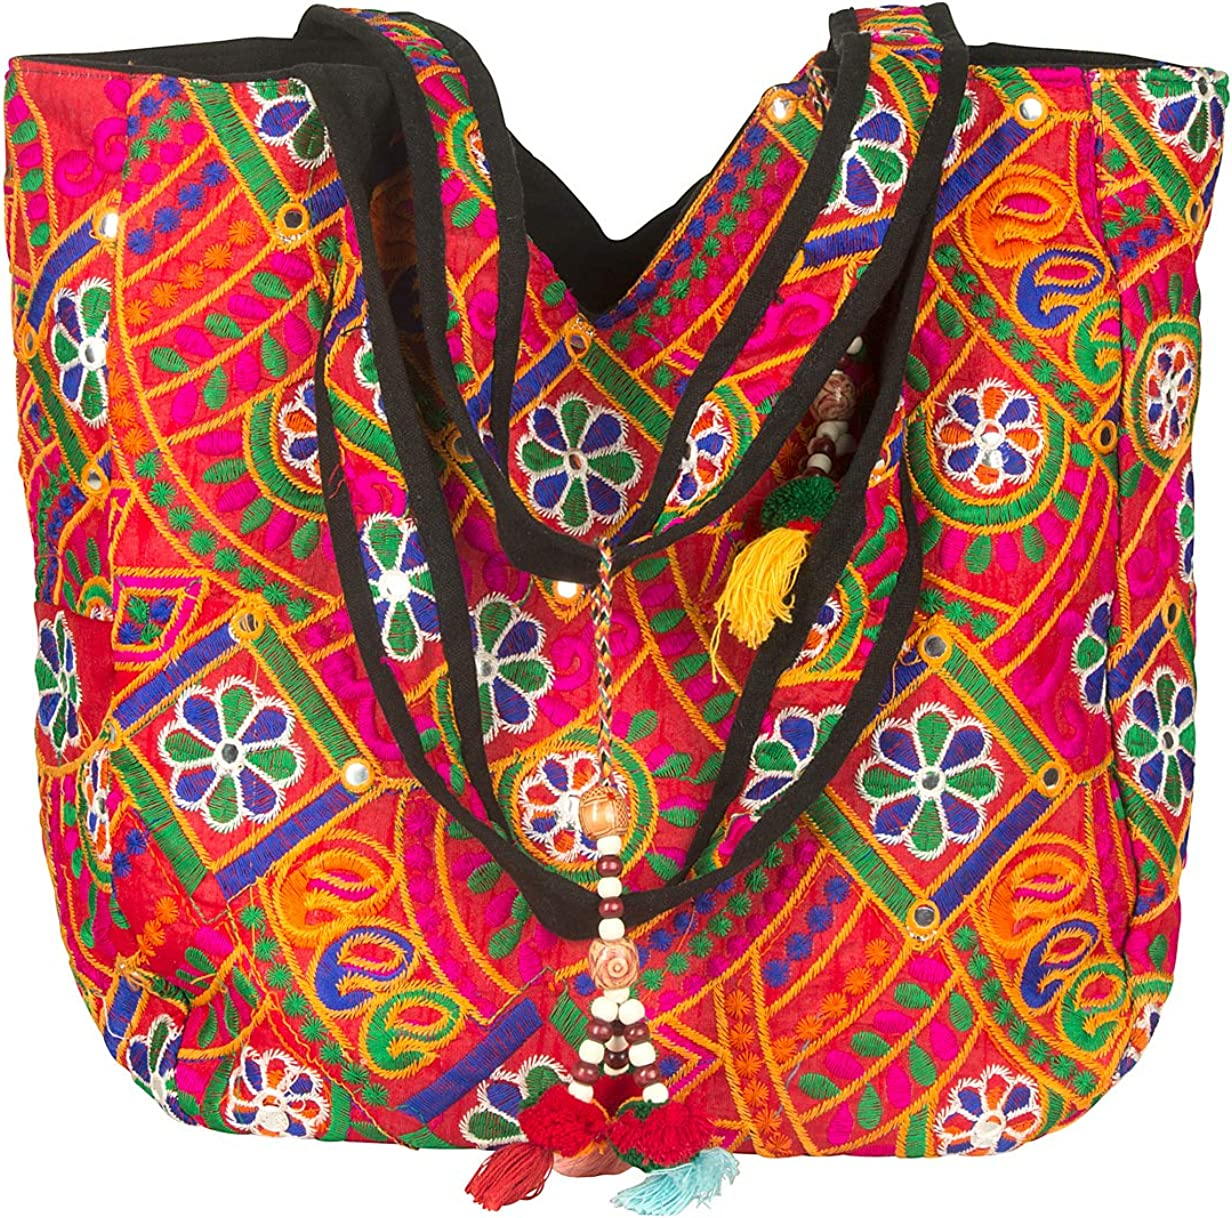 Colorful Floral Boho Large Shoulder Bag Tote Handbag Casual Spacious Market School Beach Books Travel